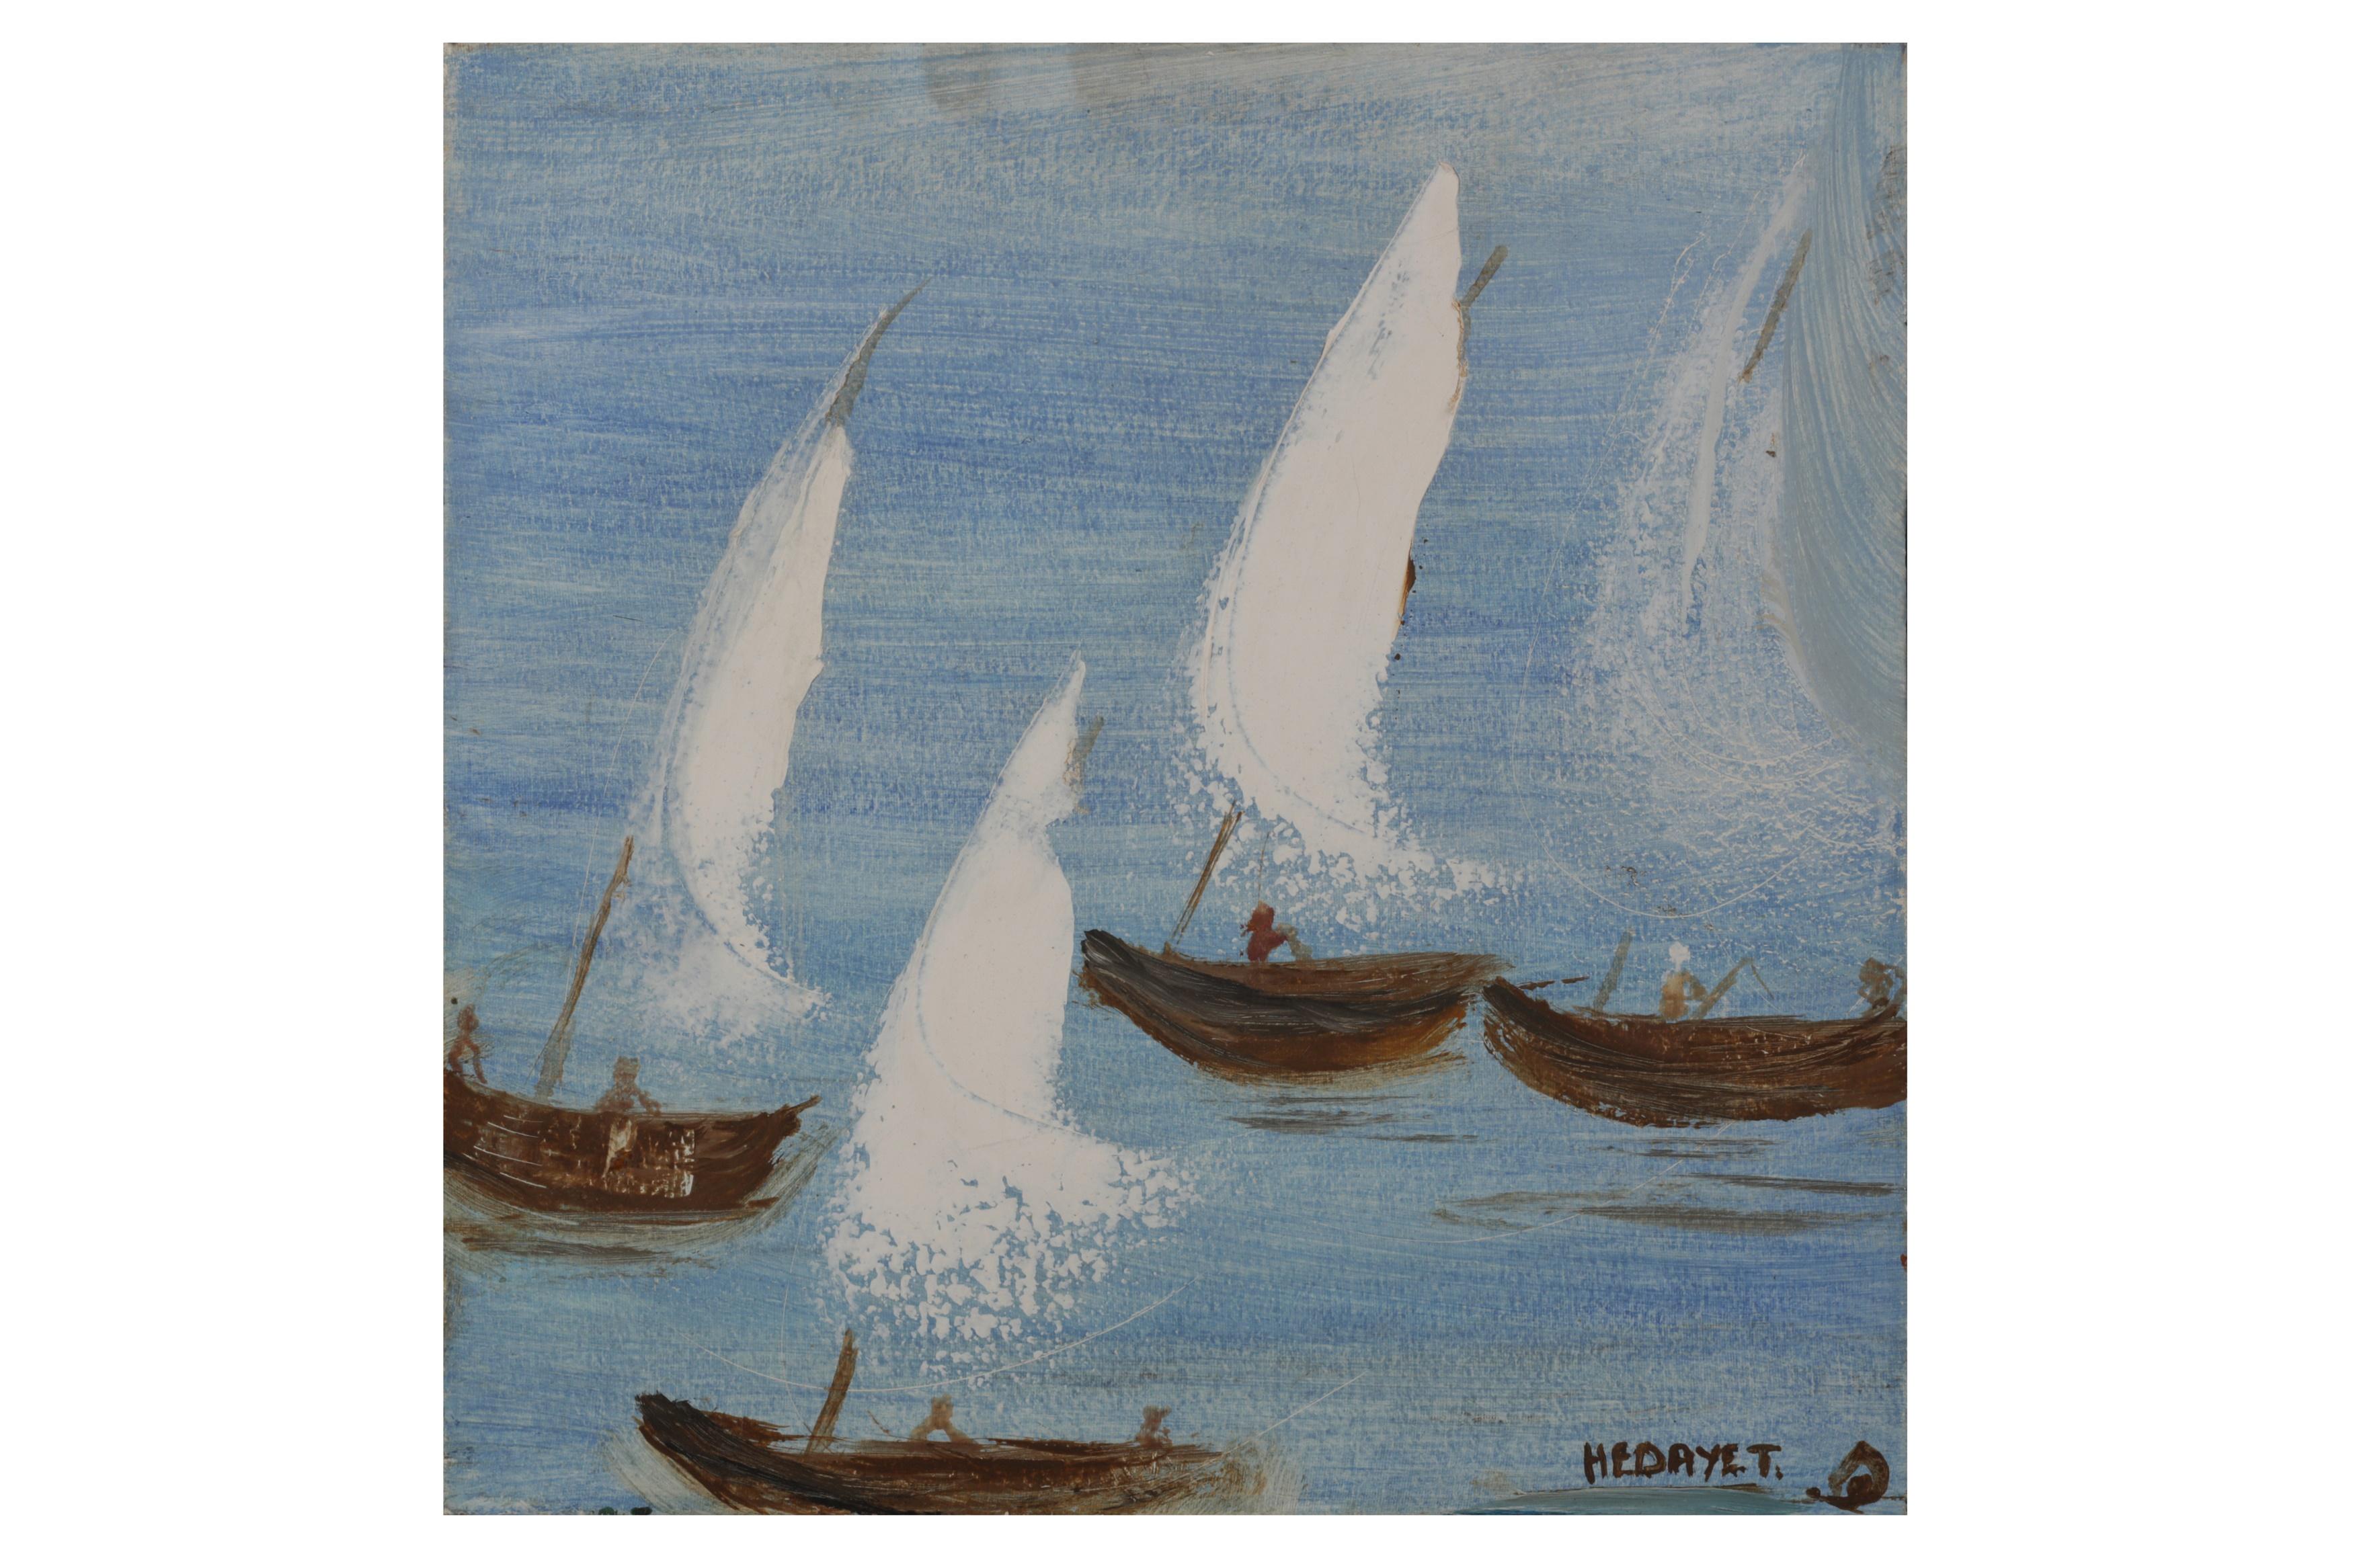 Boats by Hidayet Chiraz